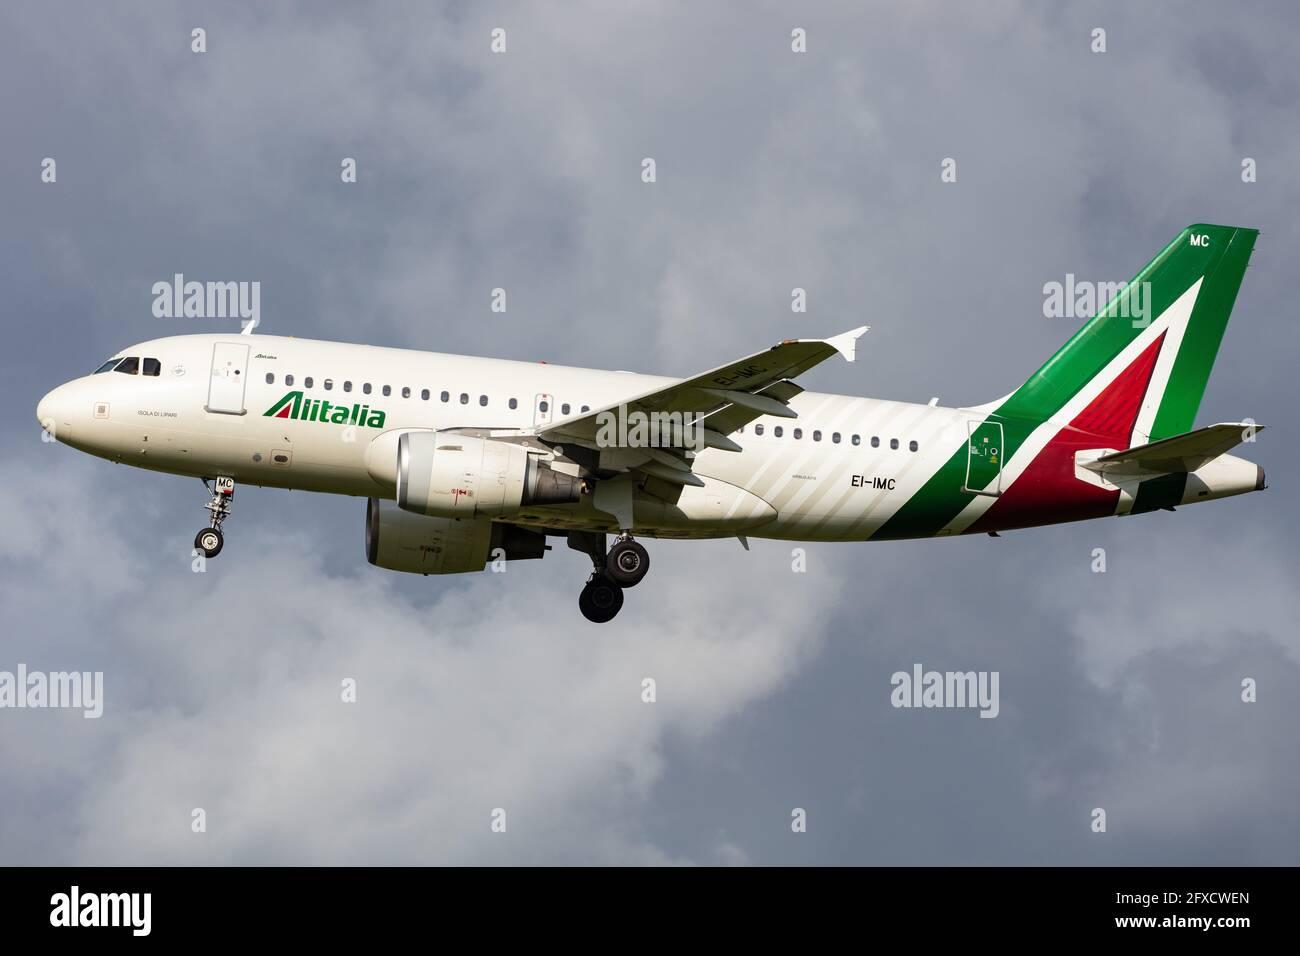 ÁMSTERDAM, PAÍSES BAJOS - 13 de septiembre de 2020: Alitalia (AZ / AZA) que se aproxima al aeropuerto de Schiphol (EHAM/AMS) con un Airbus A319-112 (EI-IMC/2057). Foto de stock